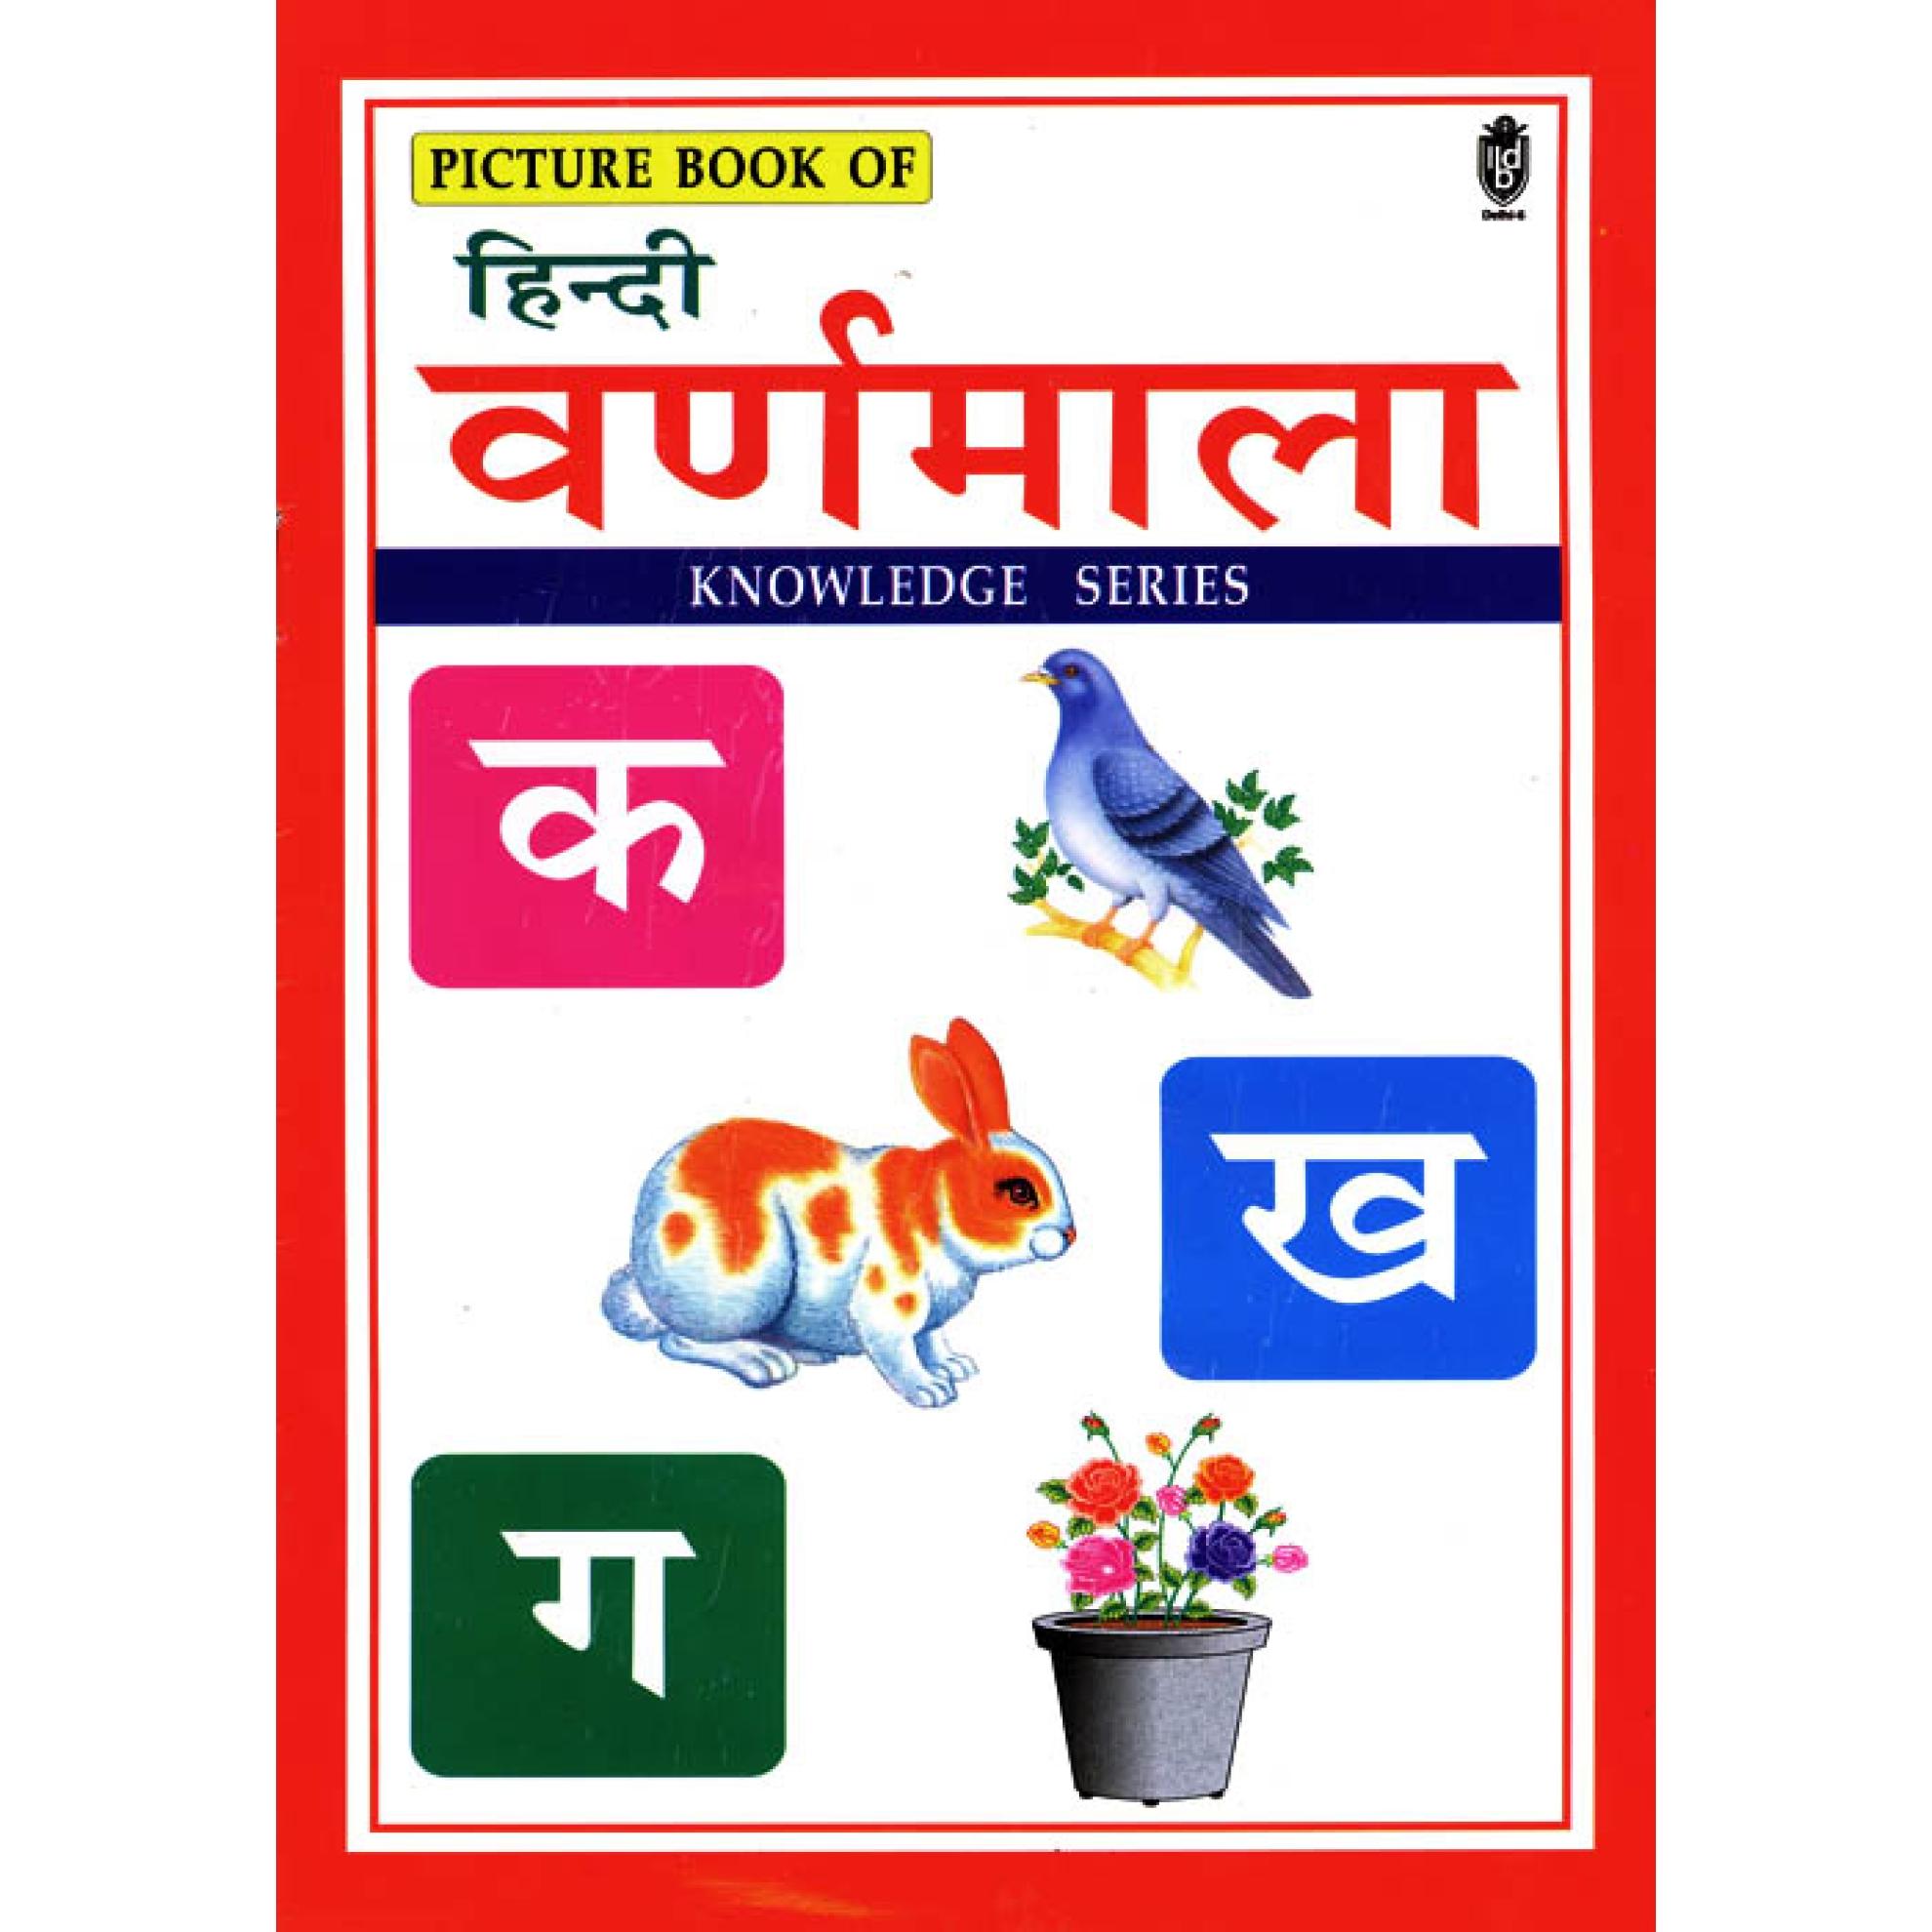 kamasutra picture book pdf hindi